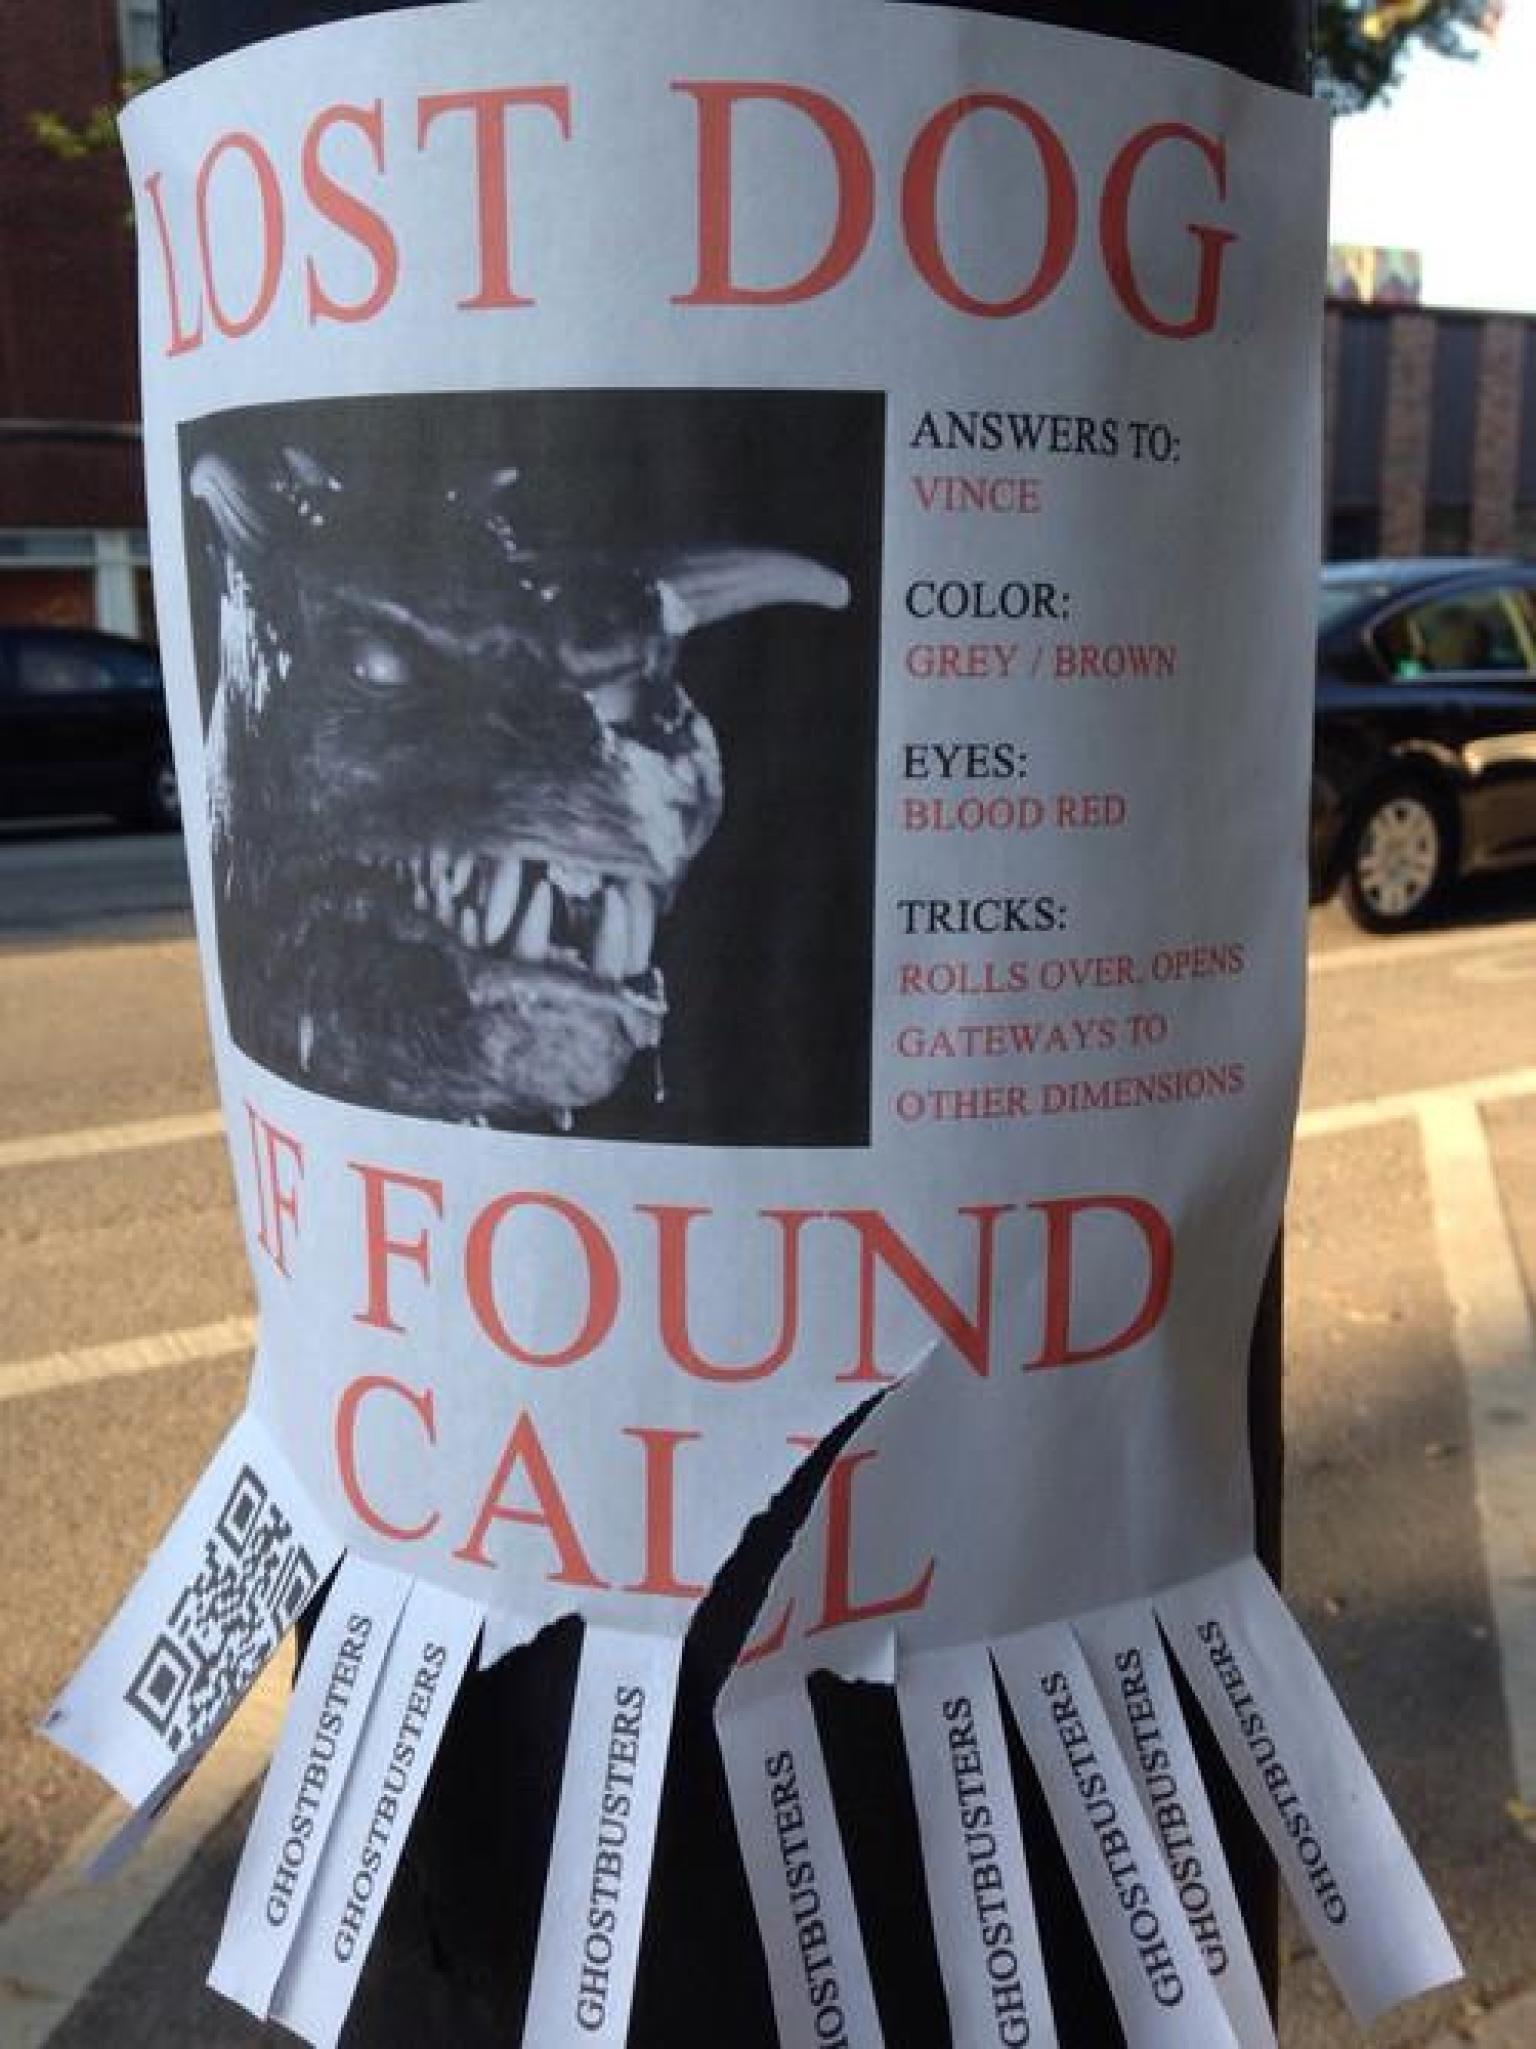 best lost dog flyer ever or best lost dog flyer ever